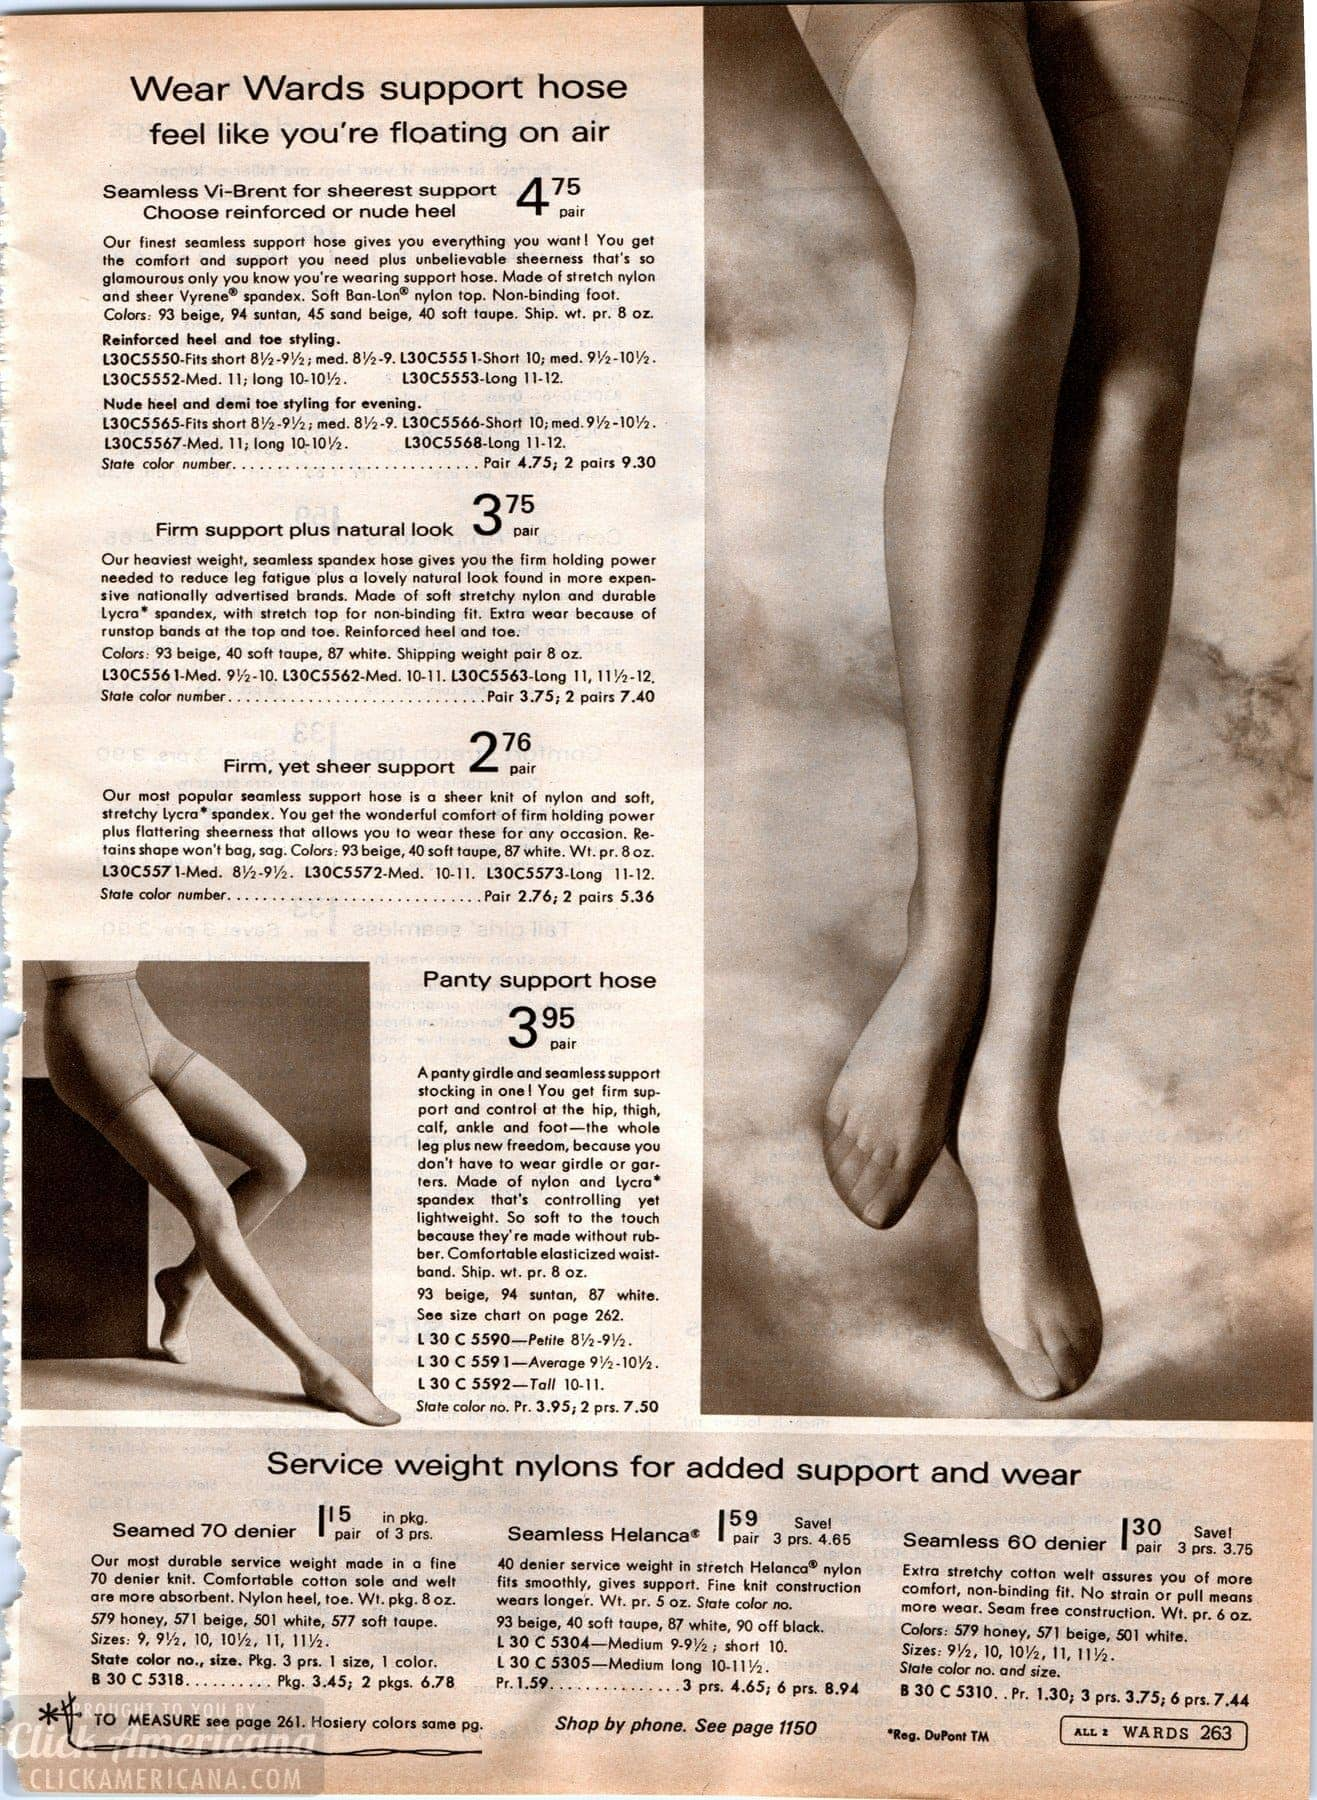 Vintage stockings - hosiery - nylons from 1968